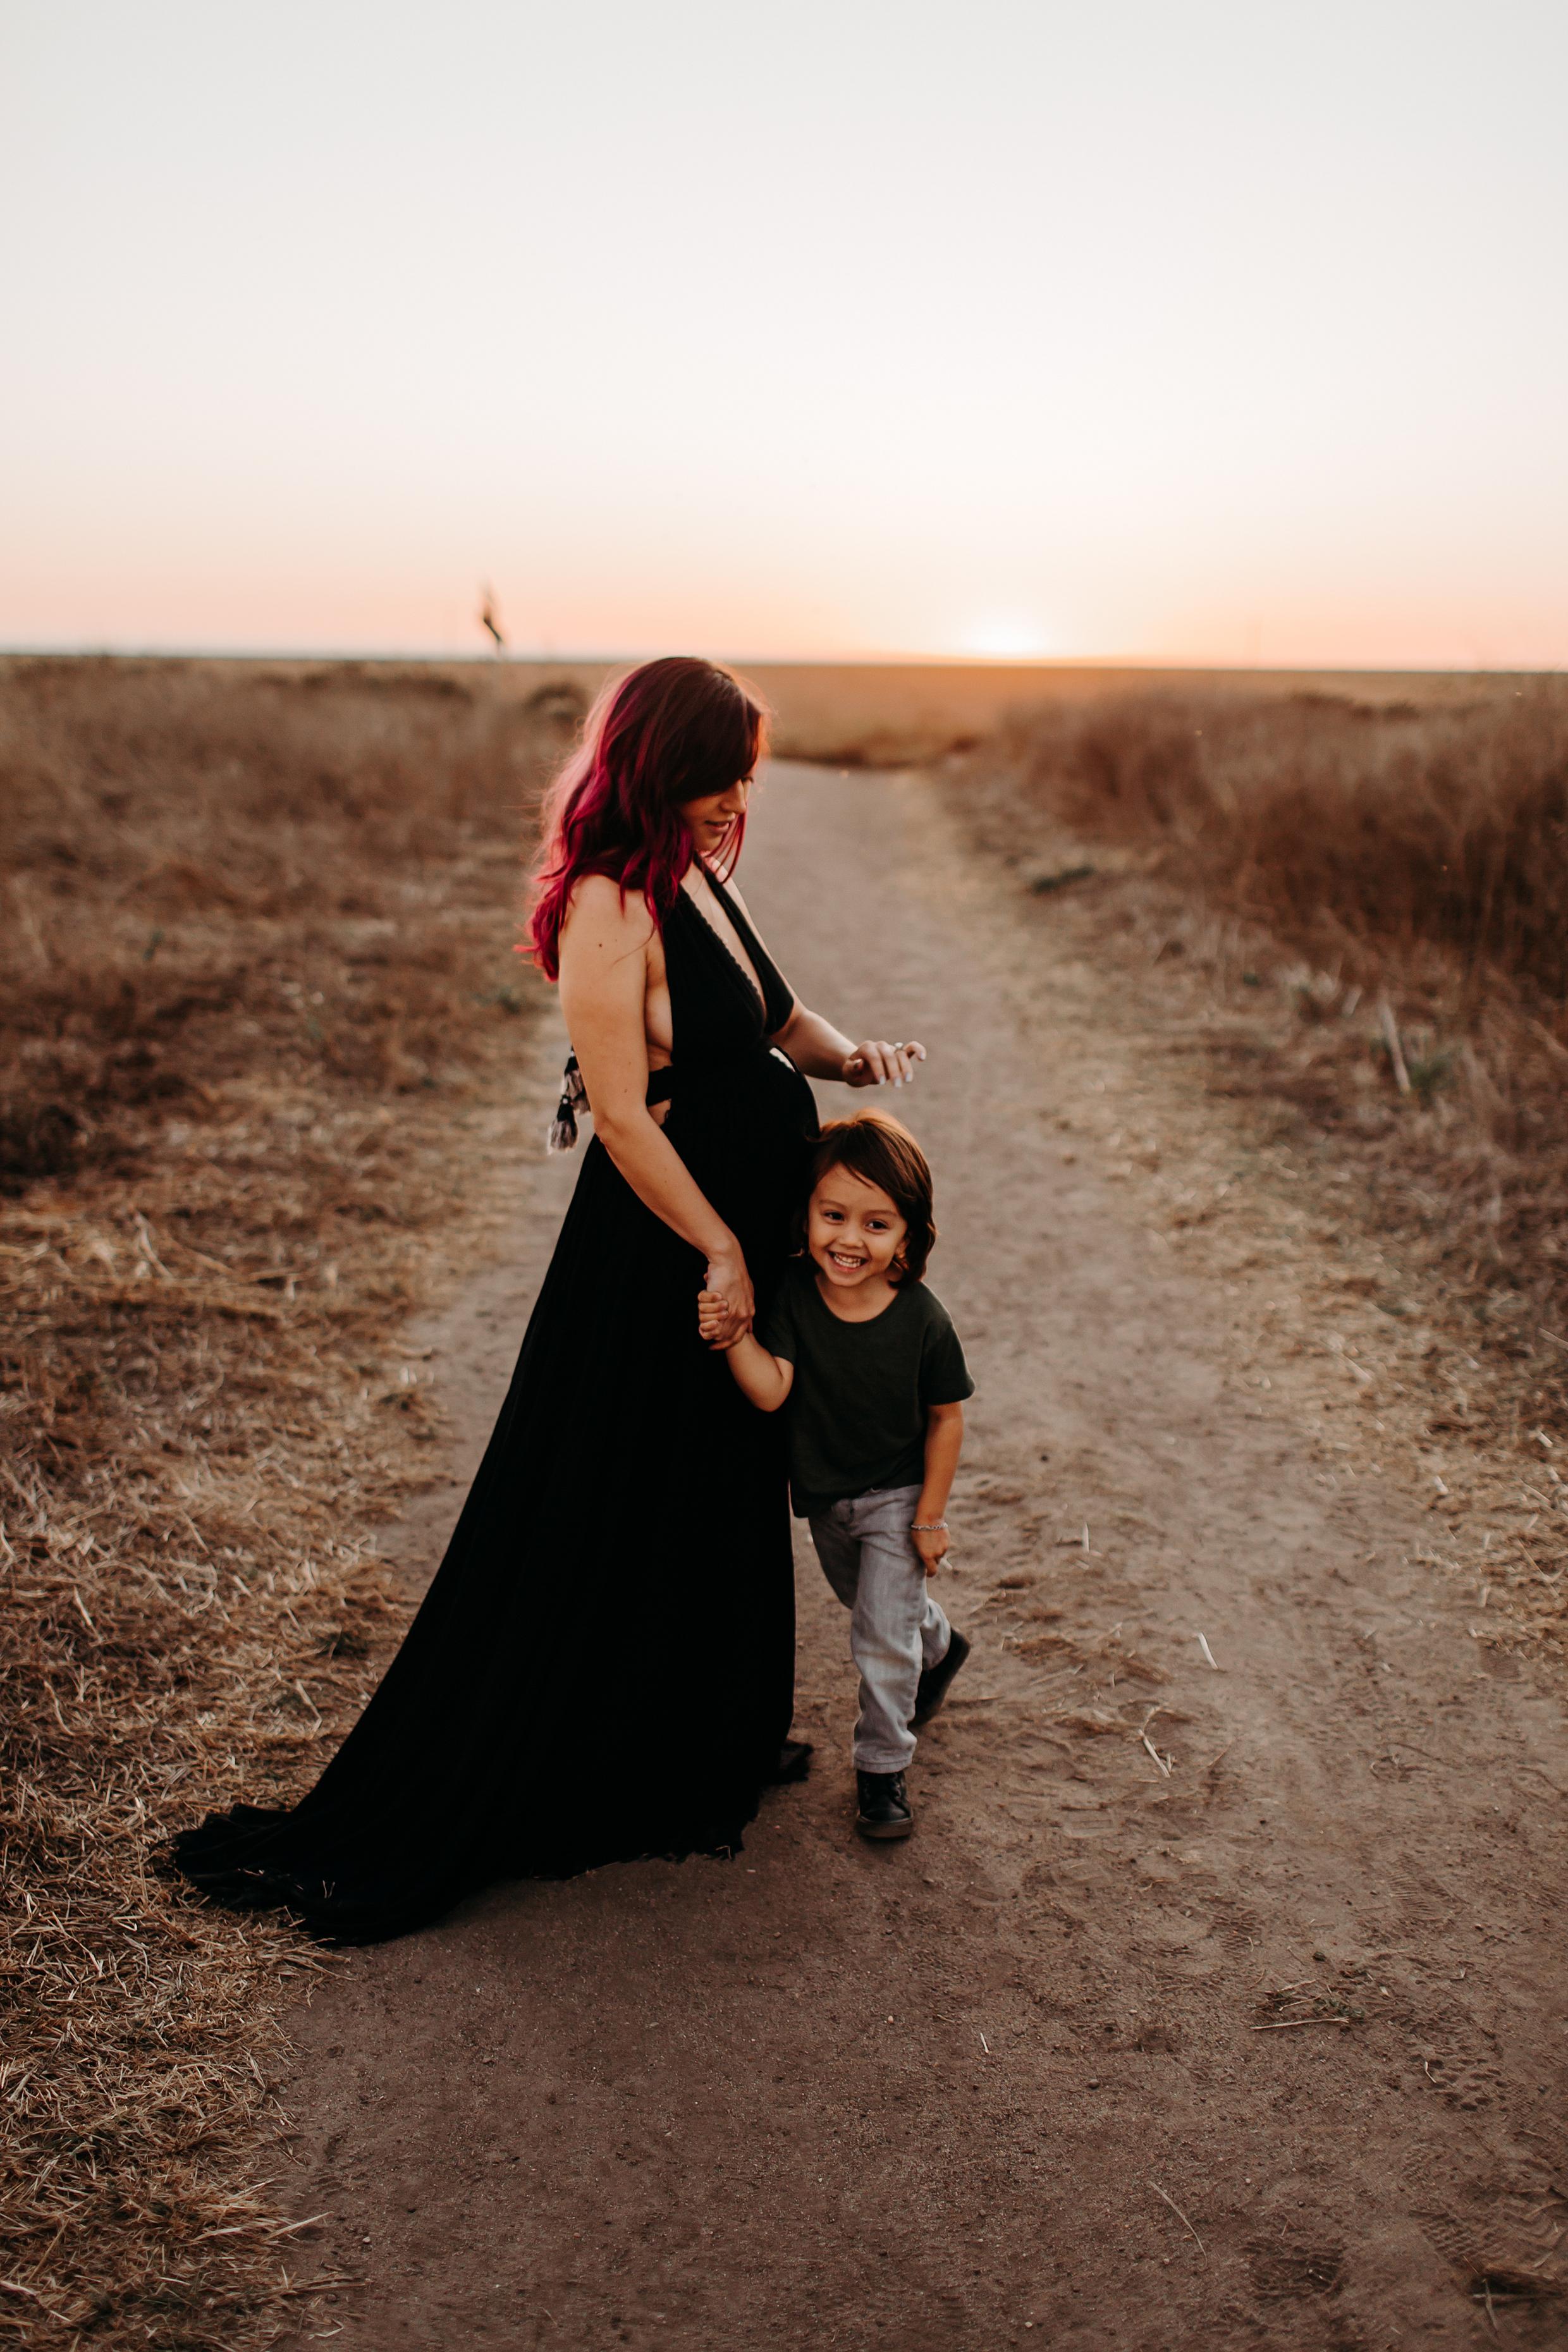 Bryanna-San-Antonio-Maternity-Photographer-104_WEB.jpg